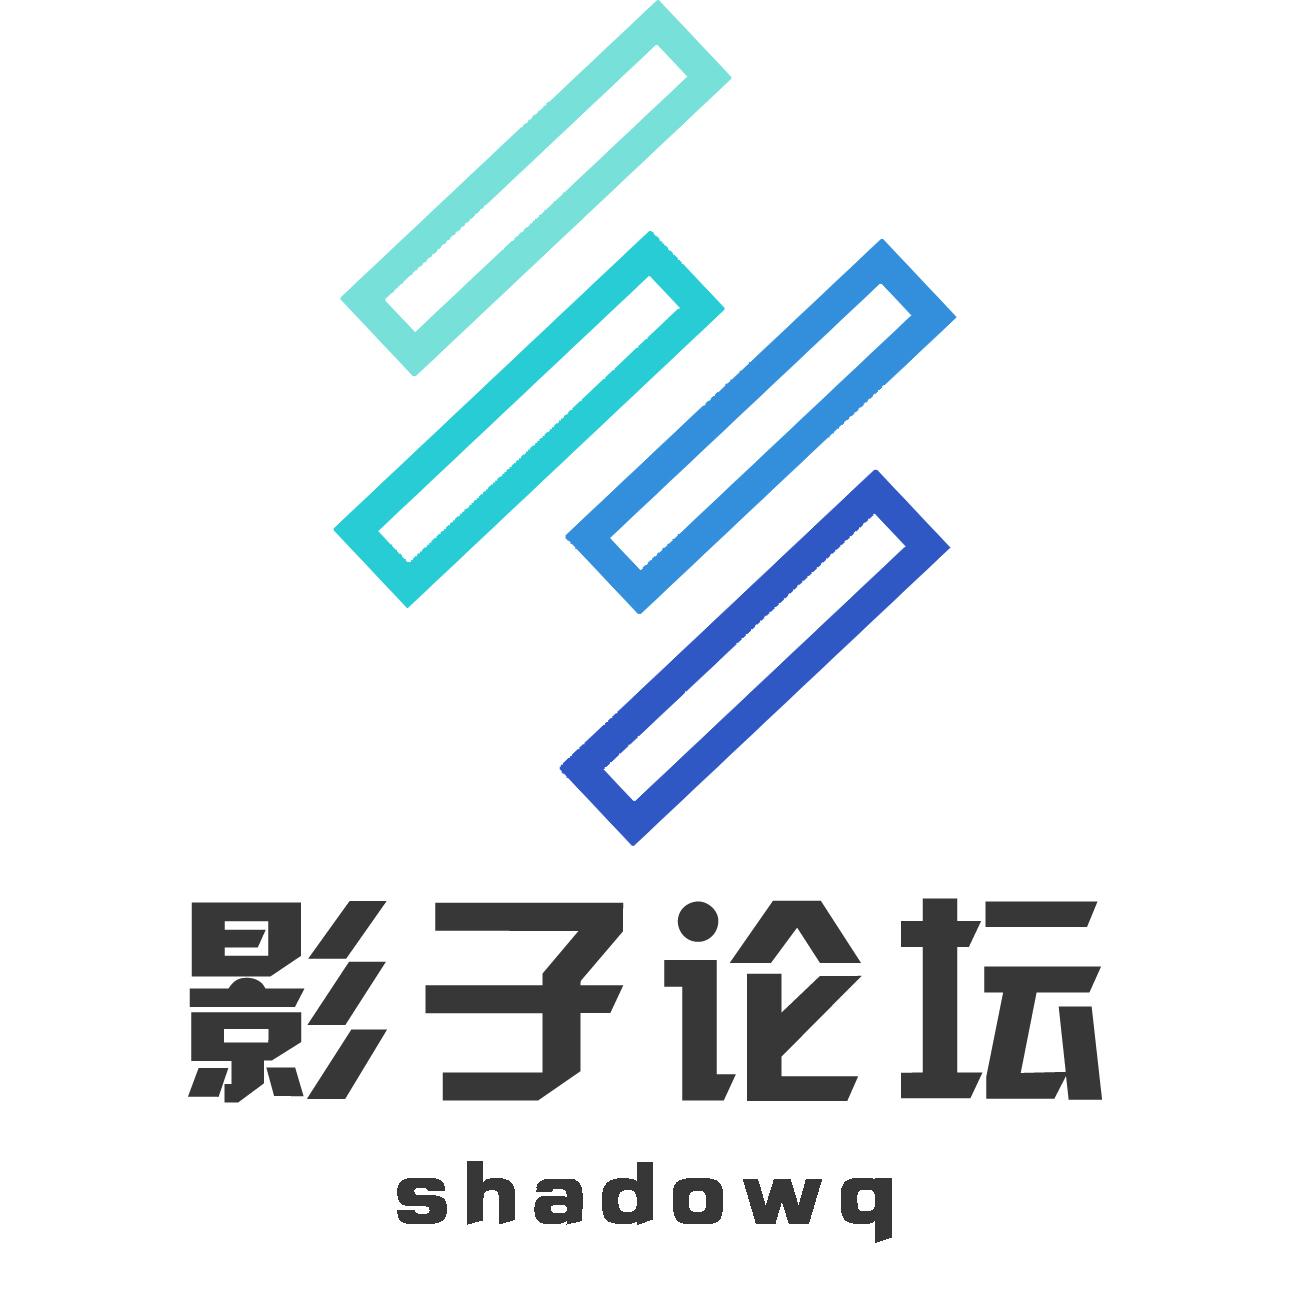 logo上下结构2020.jpg